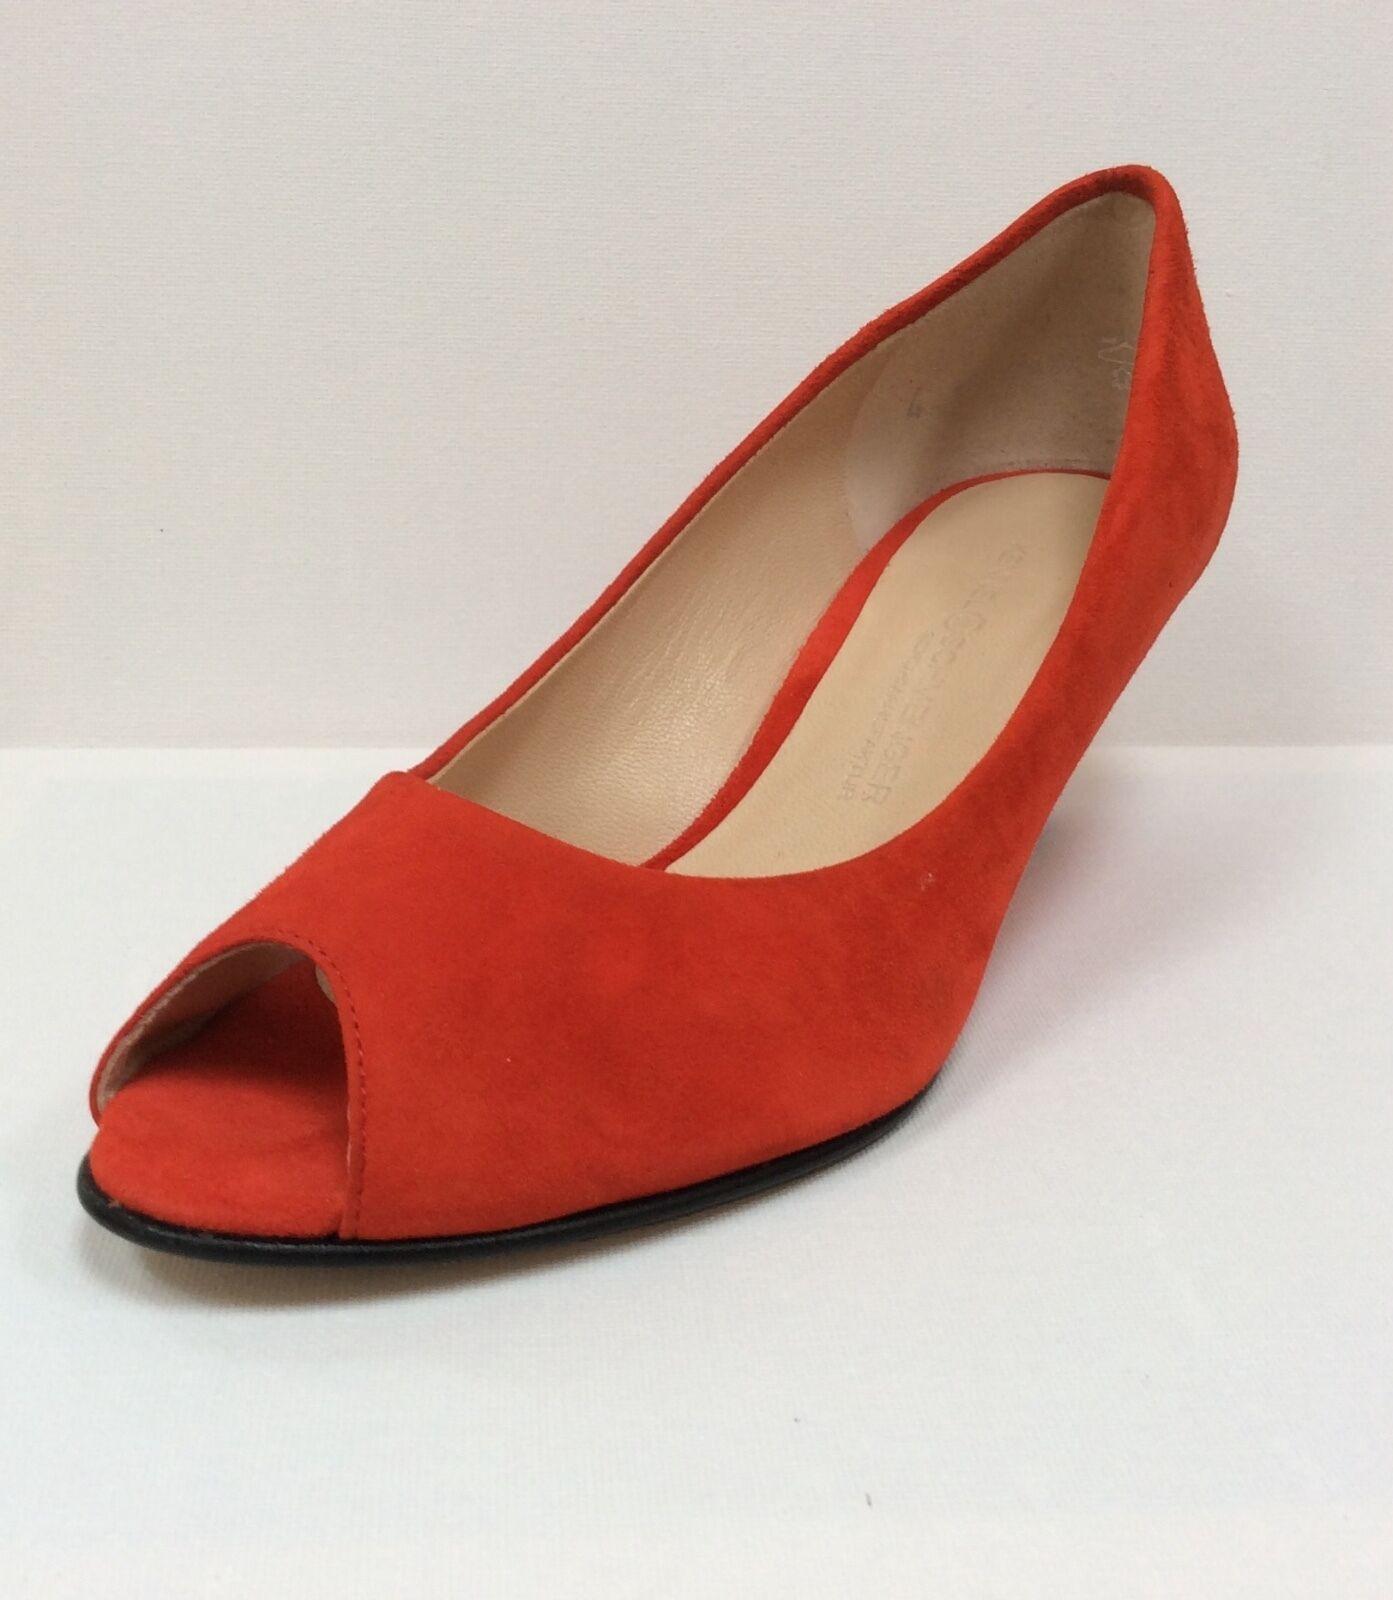 K&S coral-orange suede peep toe wedged court schuhe,UK 6.5/EU 39.5   BNWB